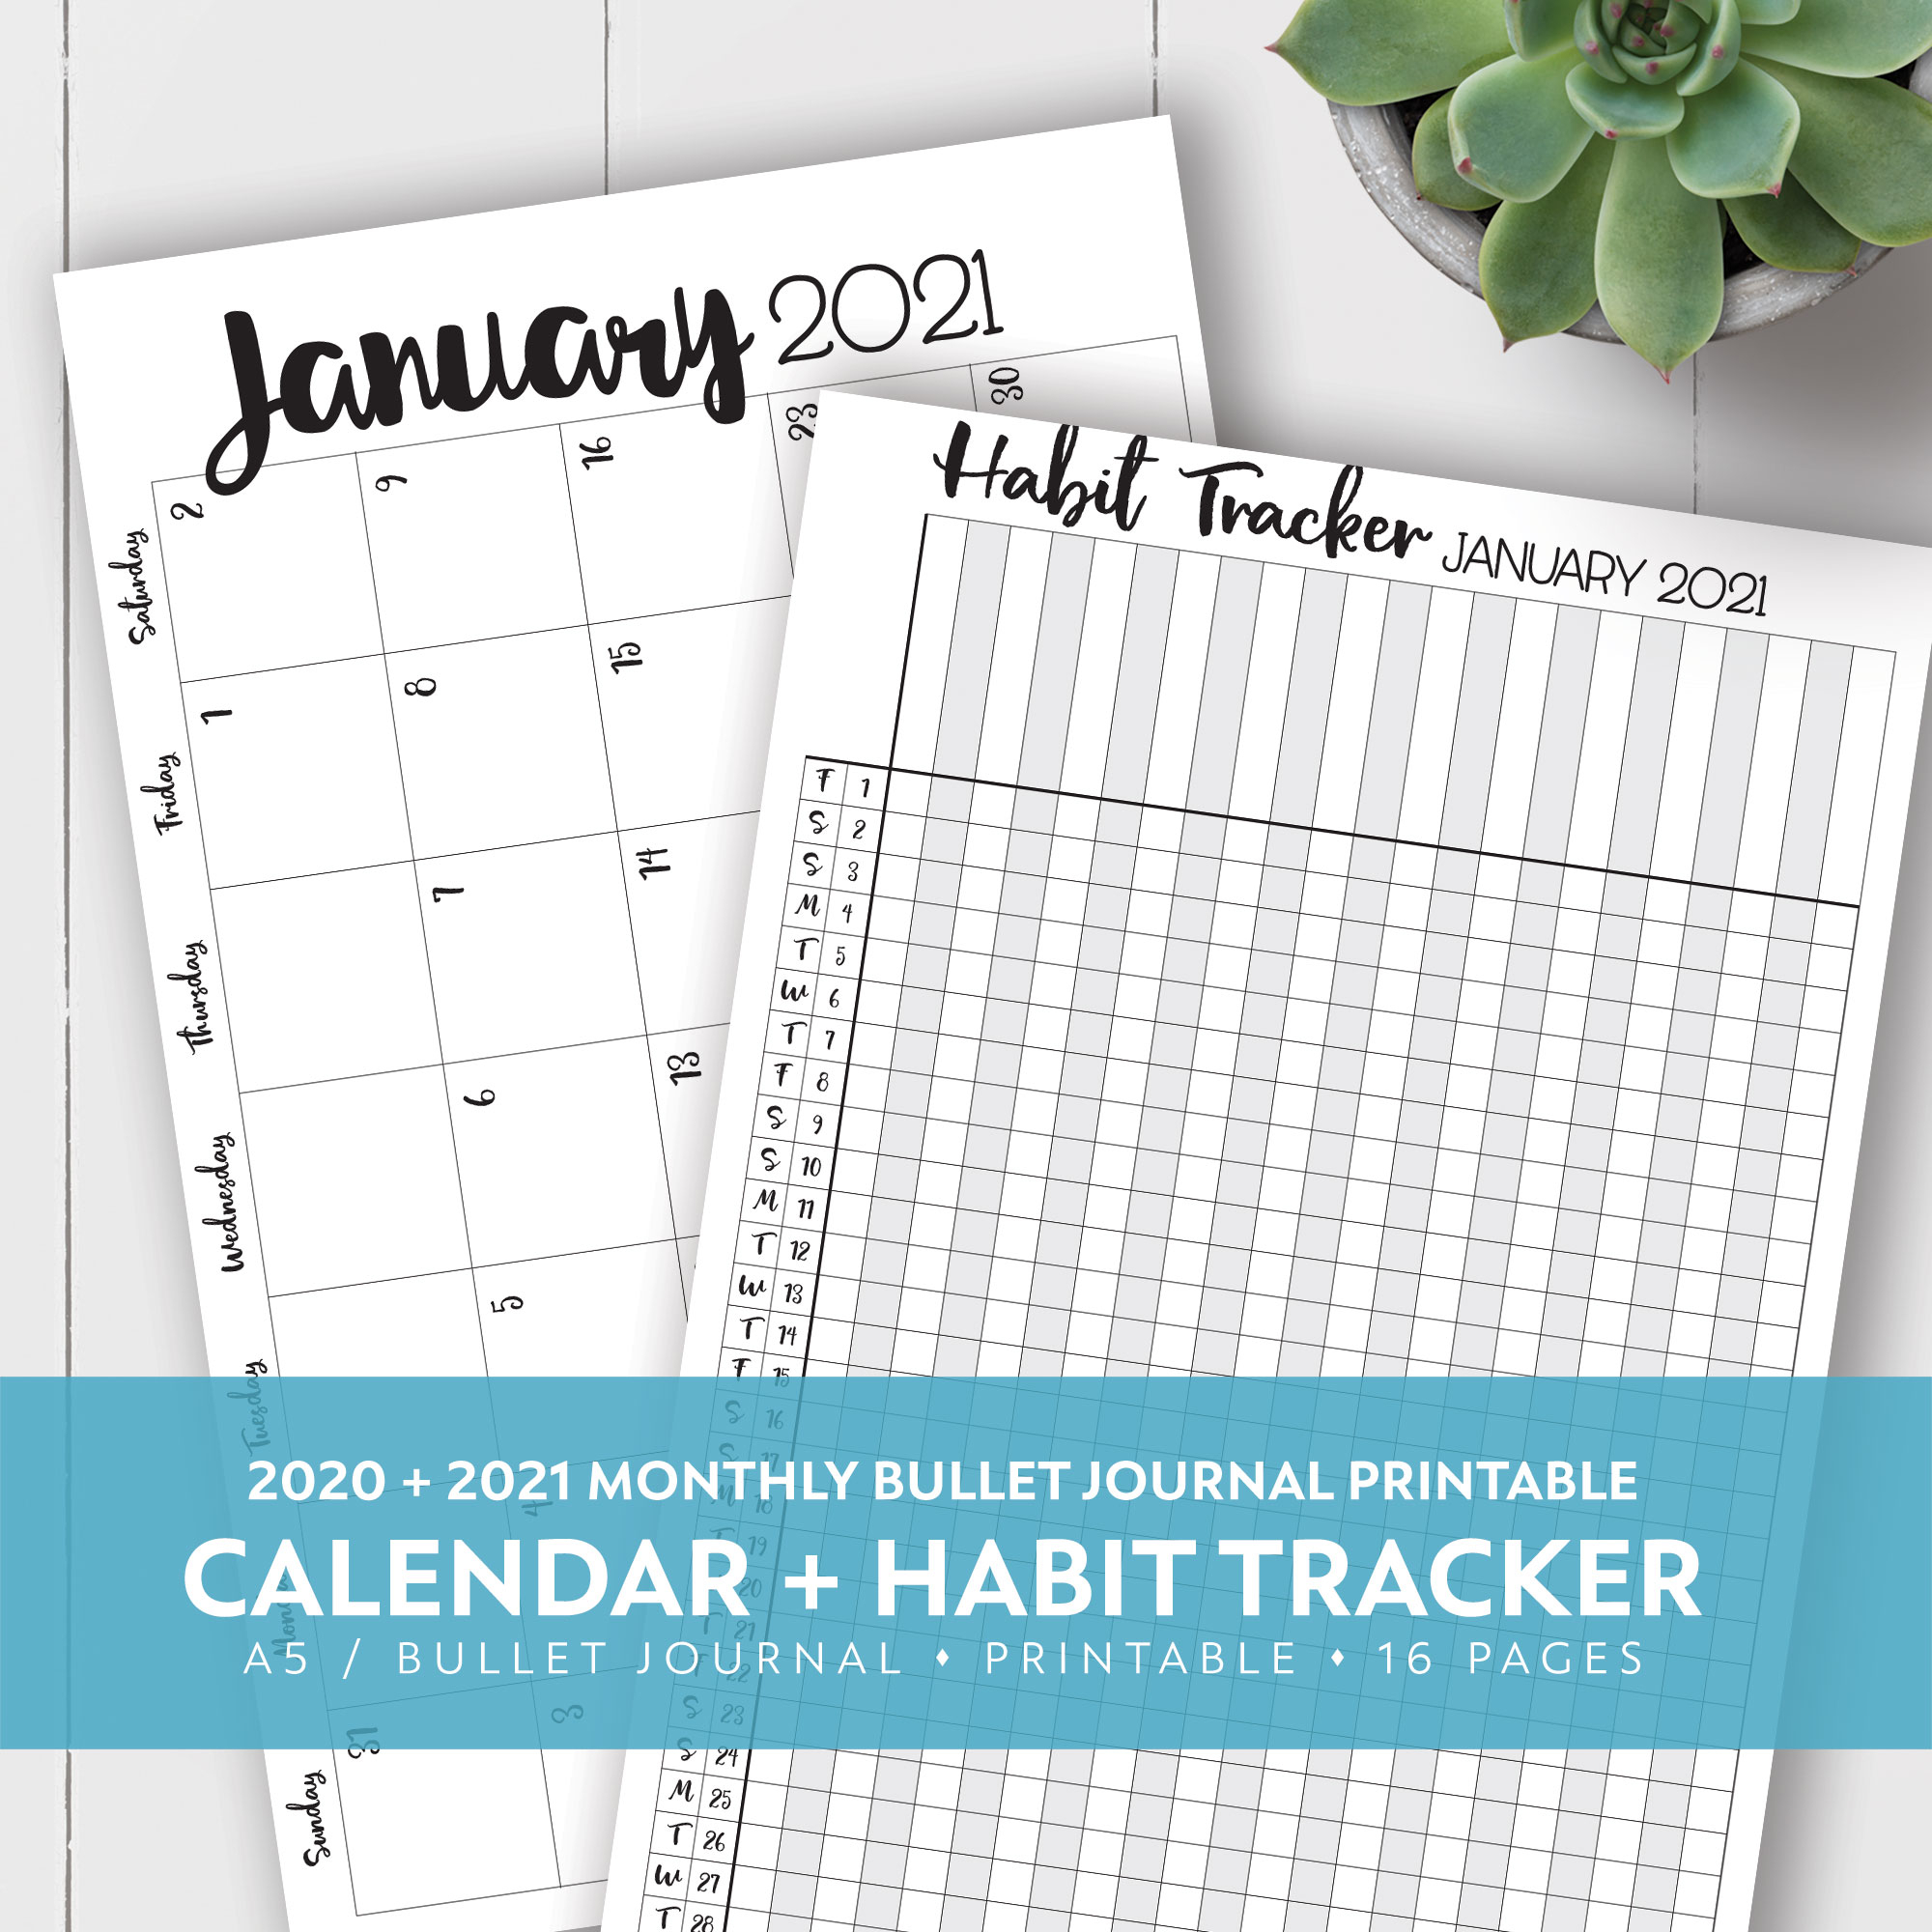 2020 + 2021 Monthly Printable Calendar + Habit Tracker Kit in Hunting Season: Calendar 2021 Monthly